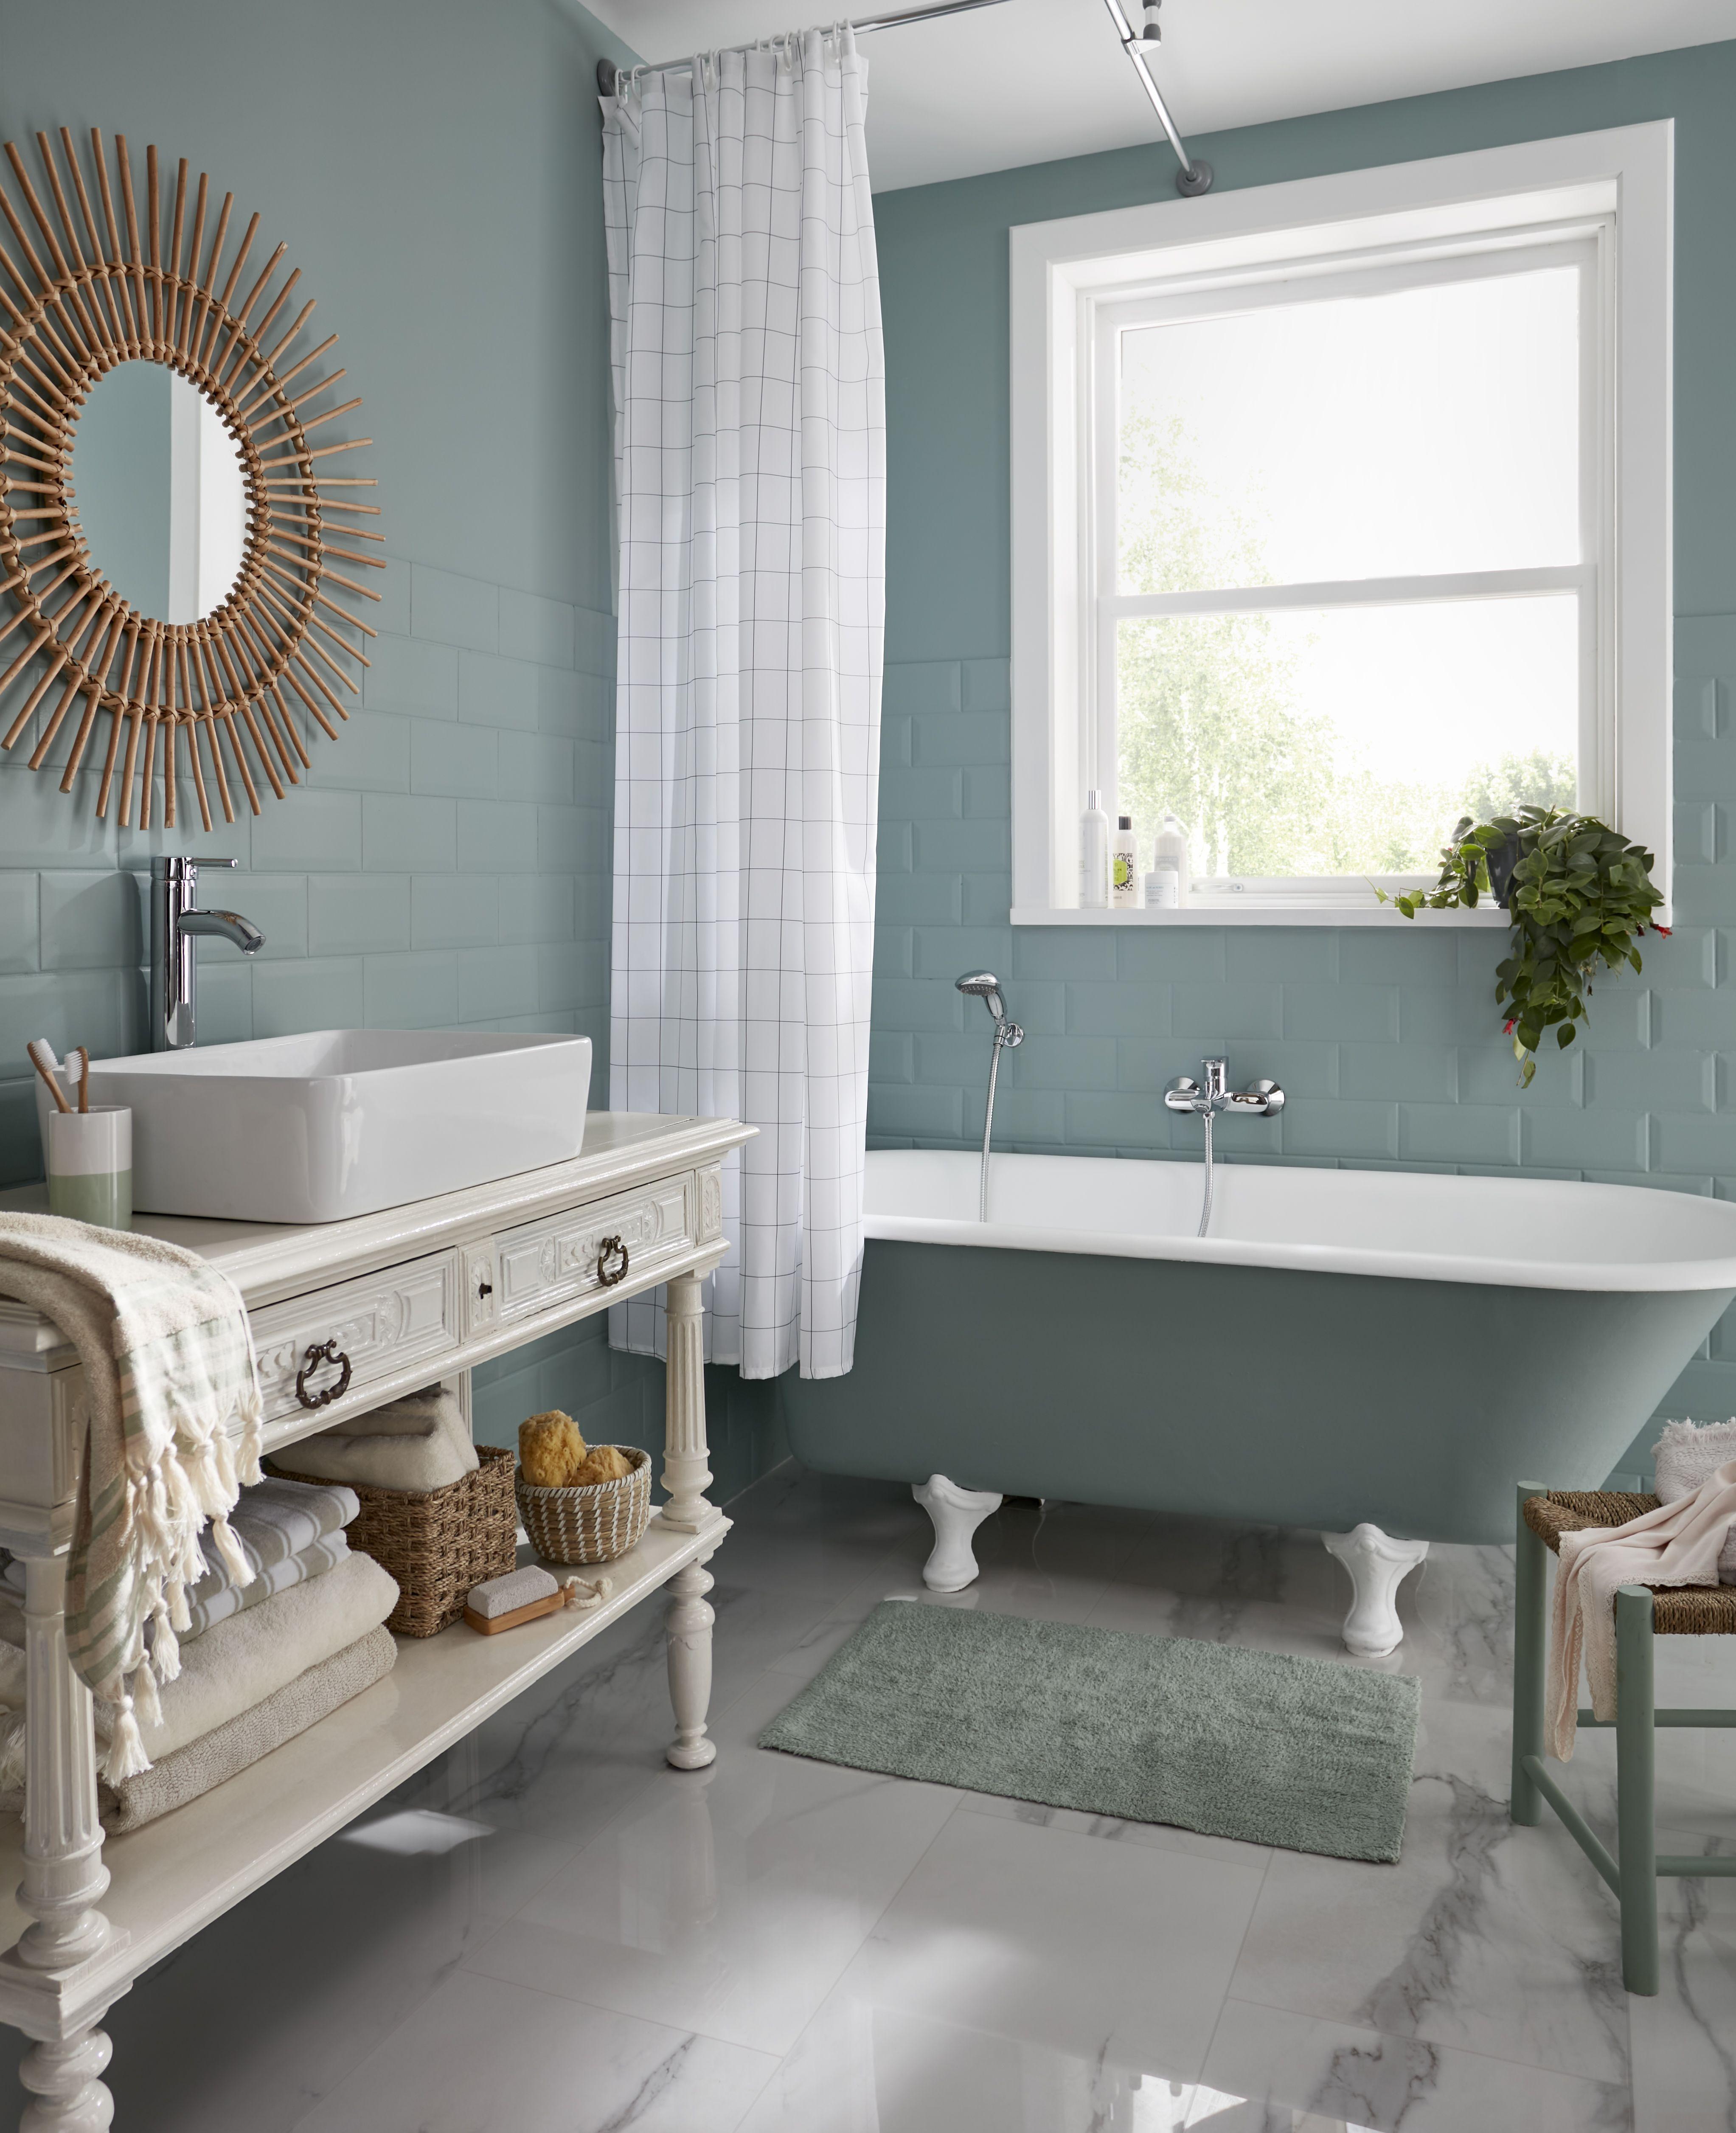 42+ Salle de bain de charme trends